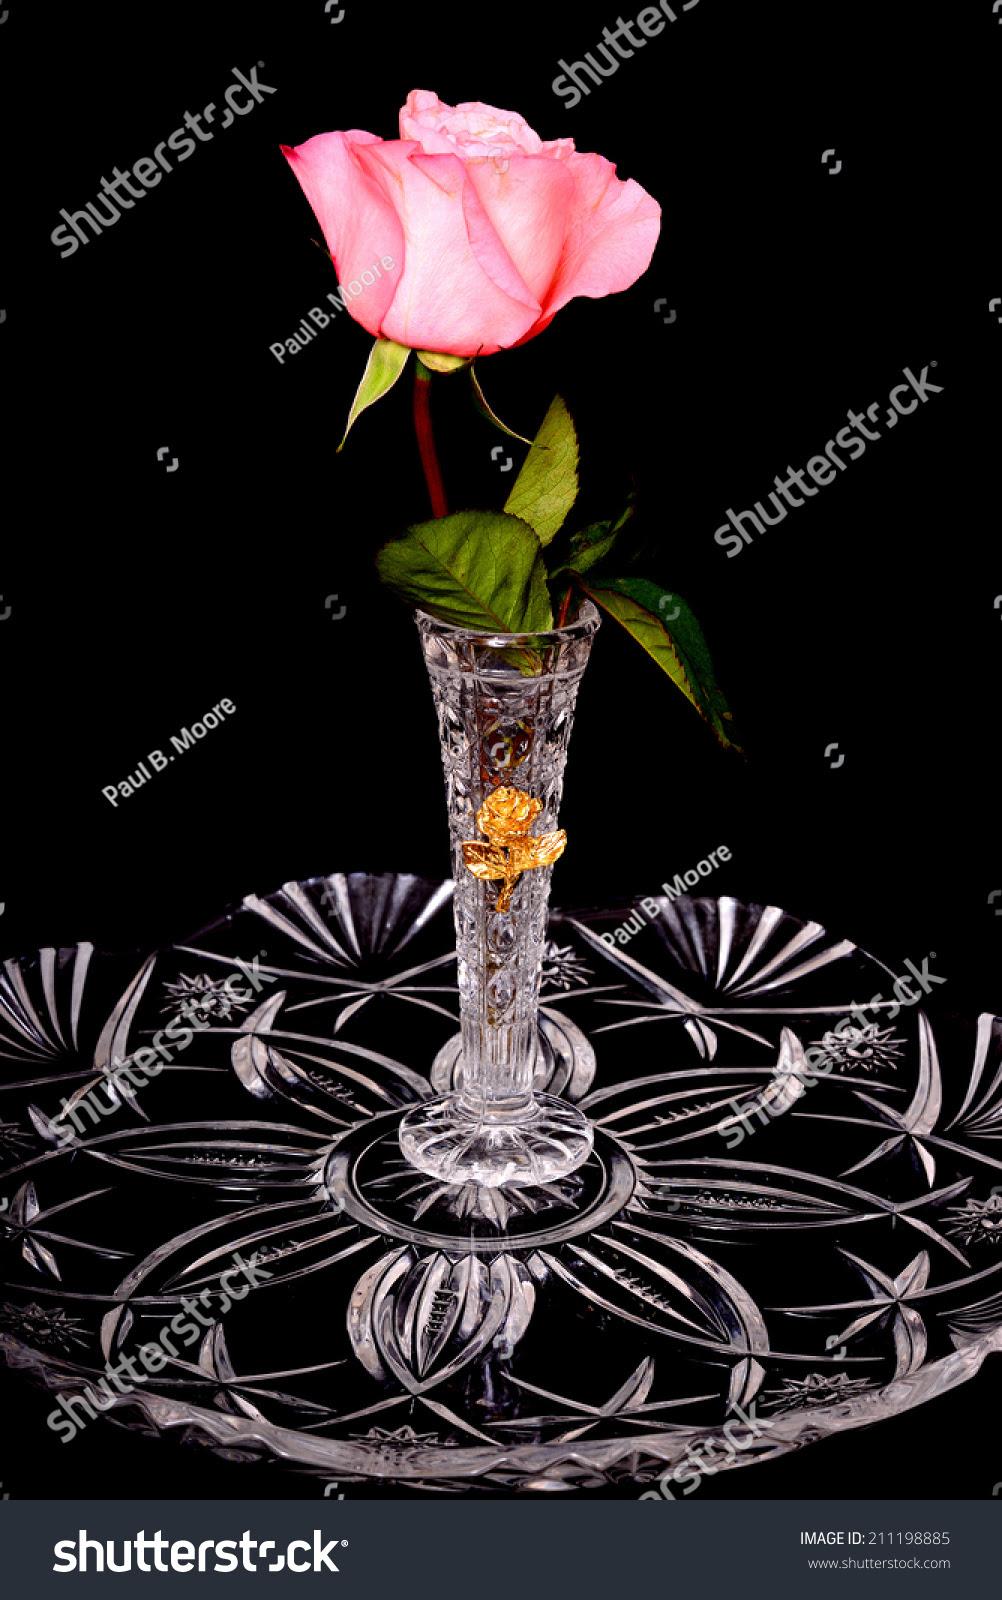 Extraordinary 4 Foot Single Stem Rose - The Green Head |Tall Pink Roses Single